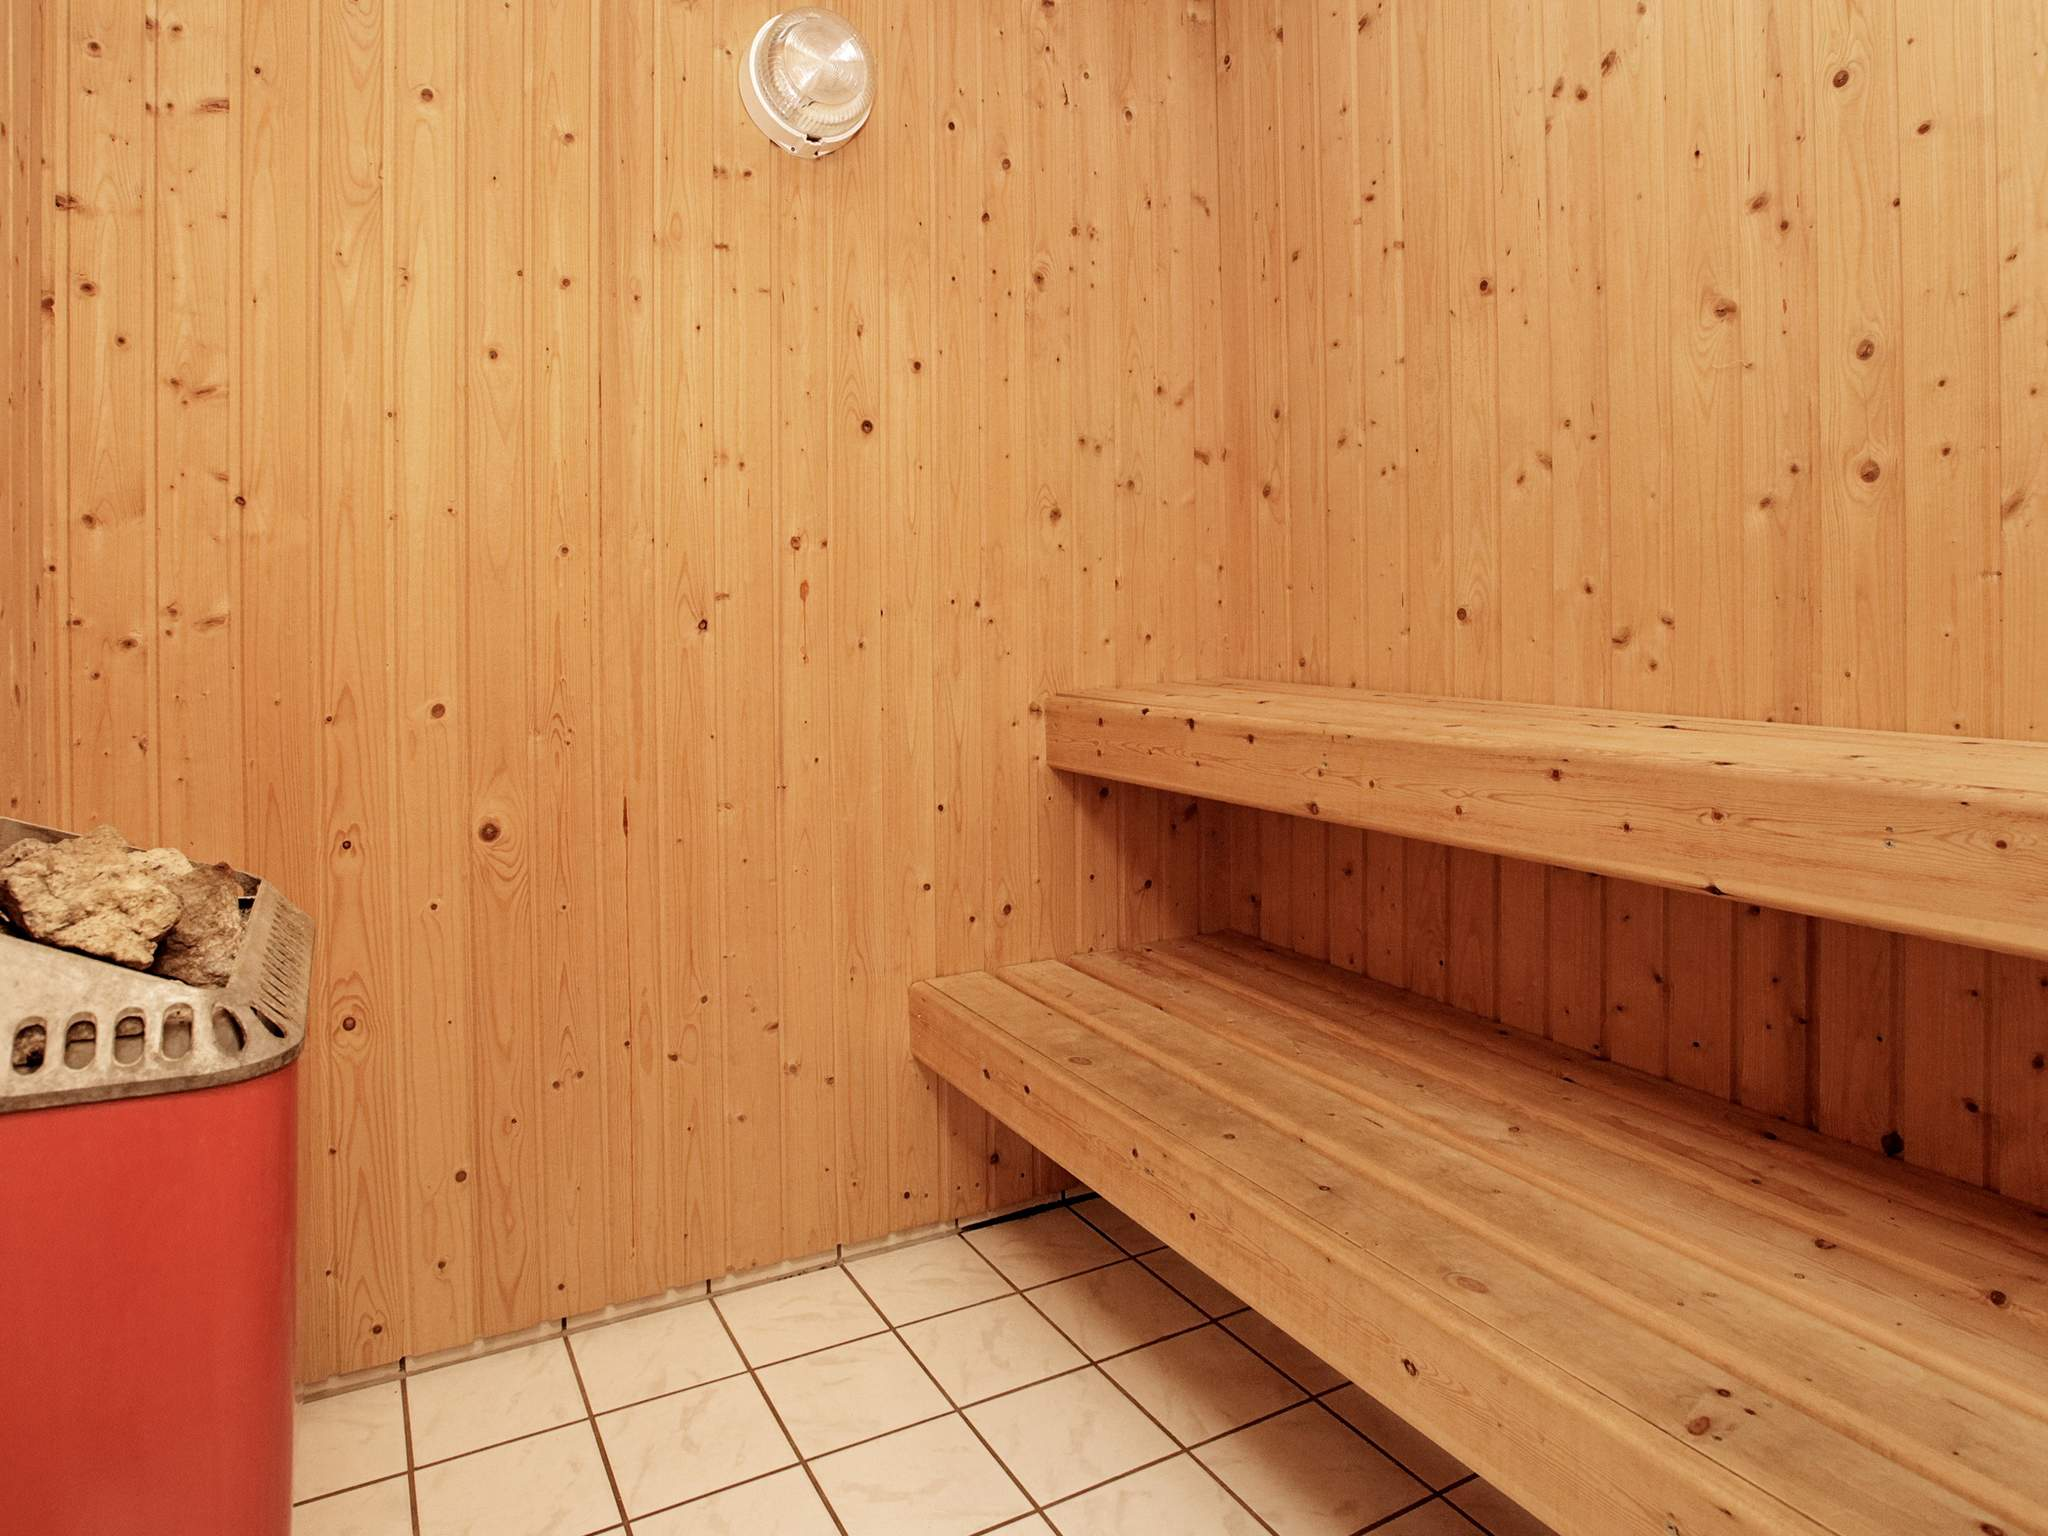 Ferienhaus Fredmosen (596960), Humble, , Langeland, Dänemark, Bild 16